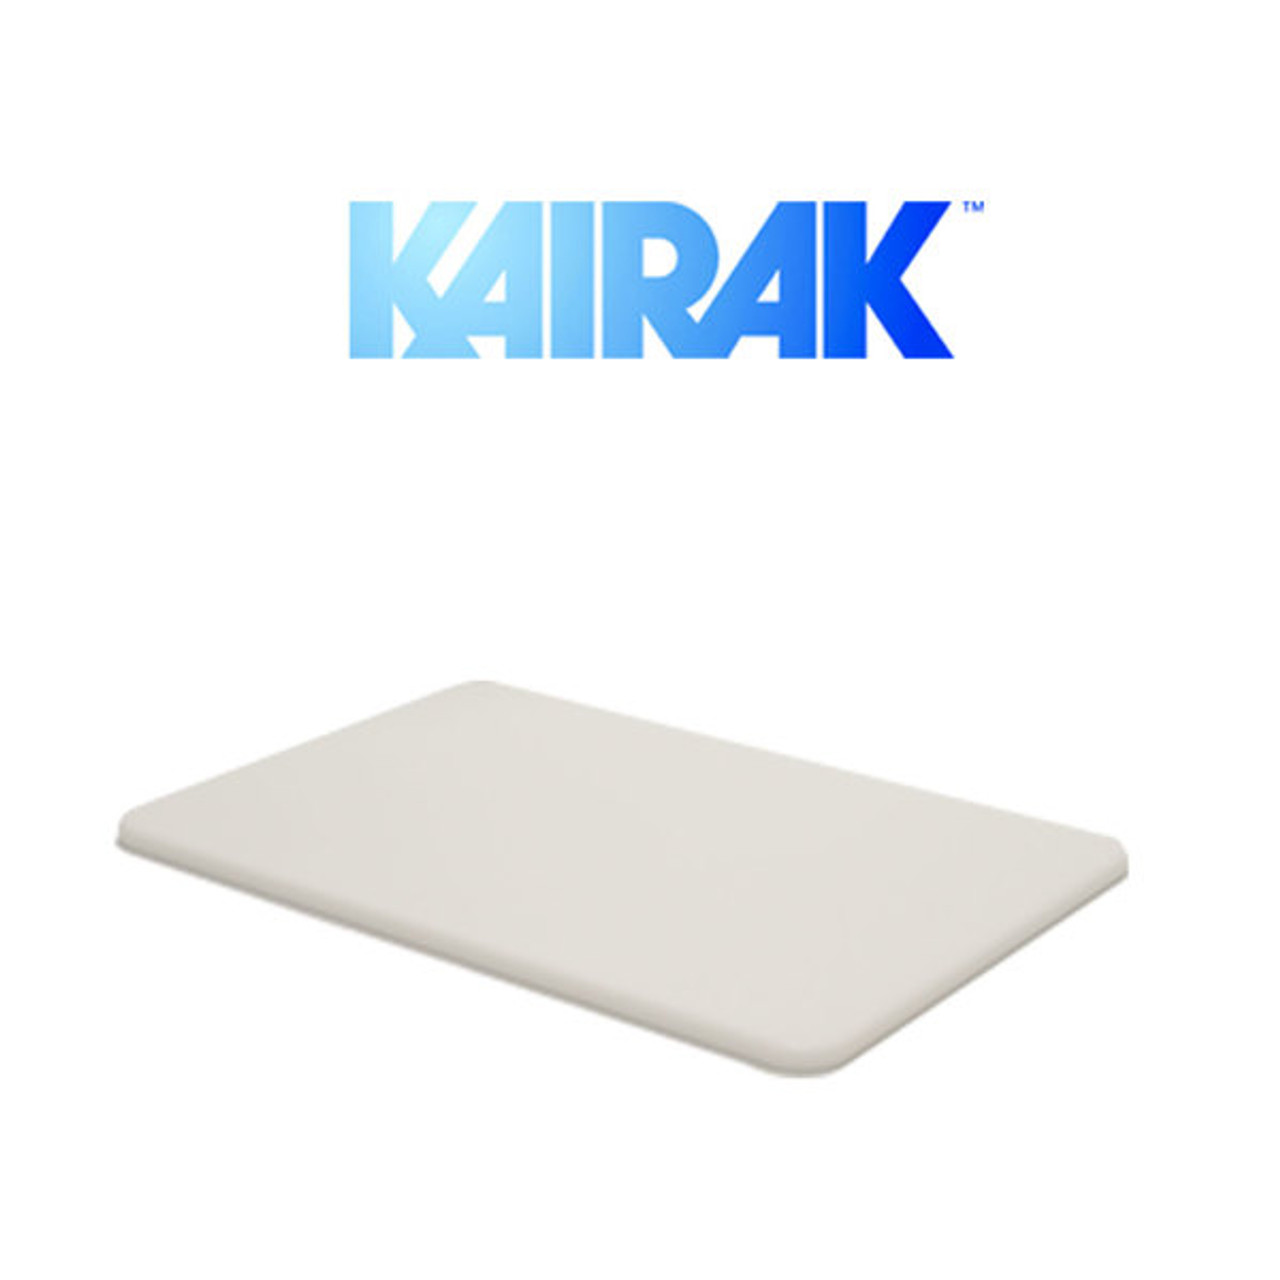 OEM Cutting Board - Kairak - P#: 2200503